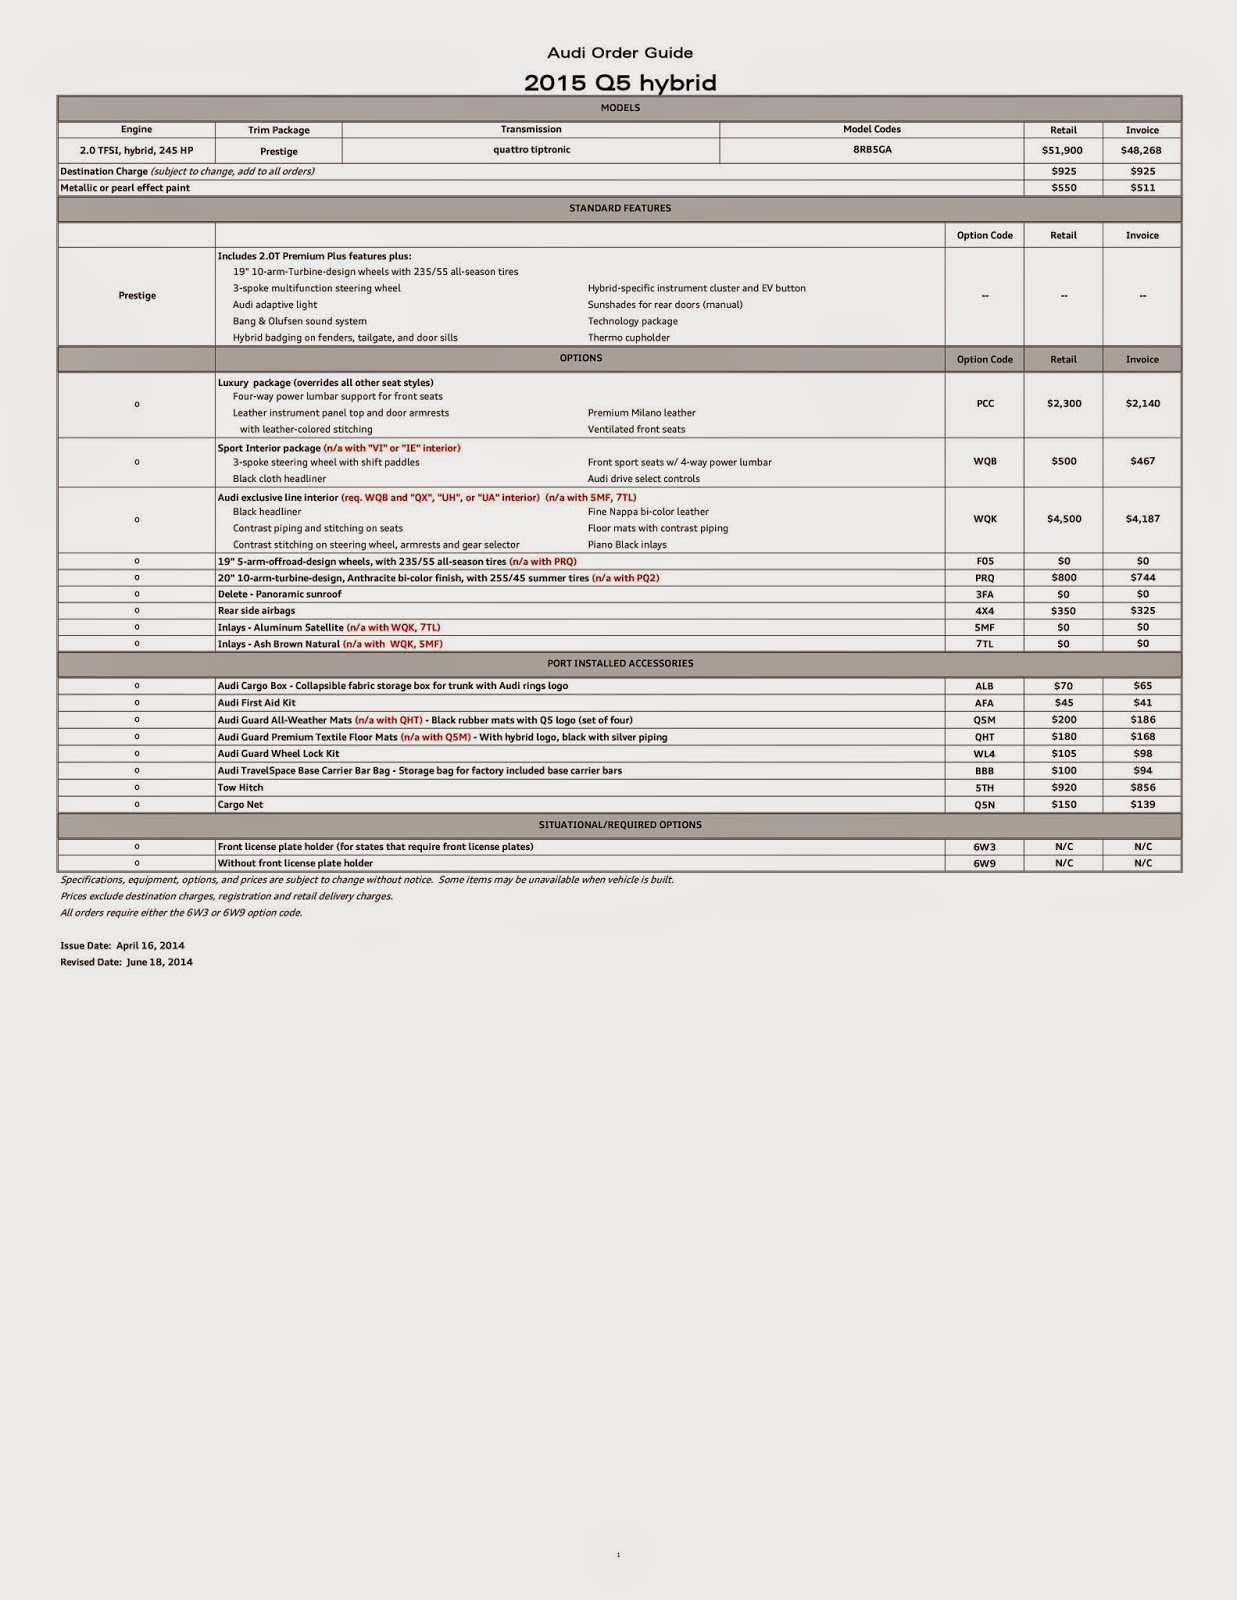 audi q5 motoring  2015 audi q5    sq5 price    order guide for us market